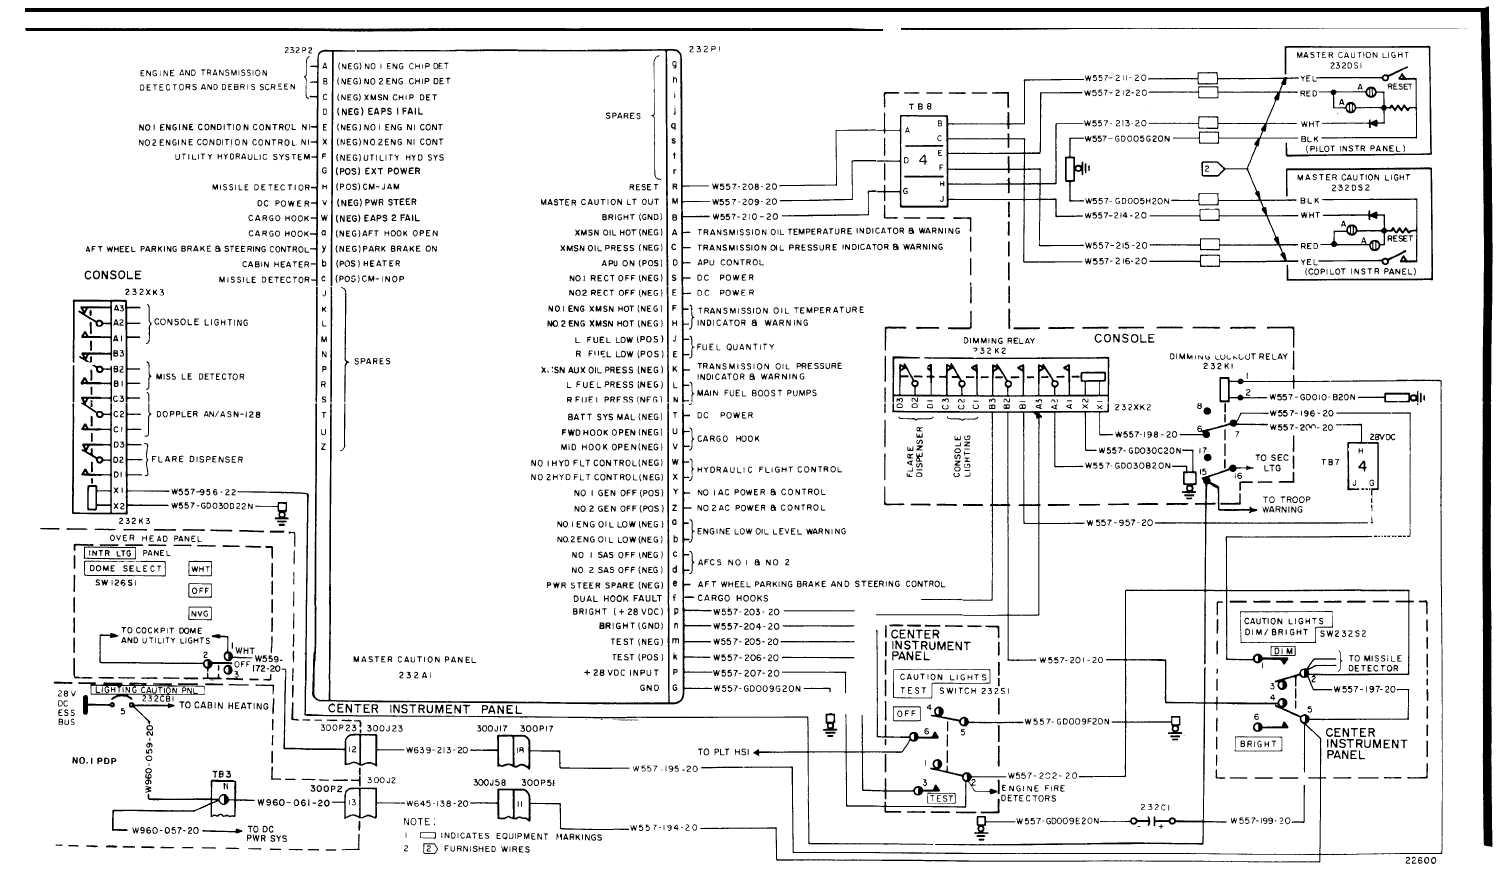 Master Caution Lights Wiring Diagram